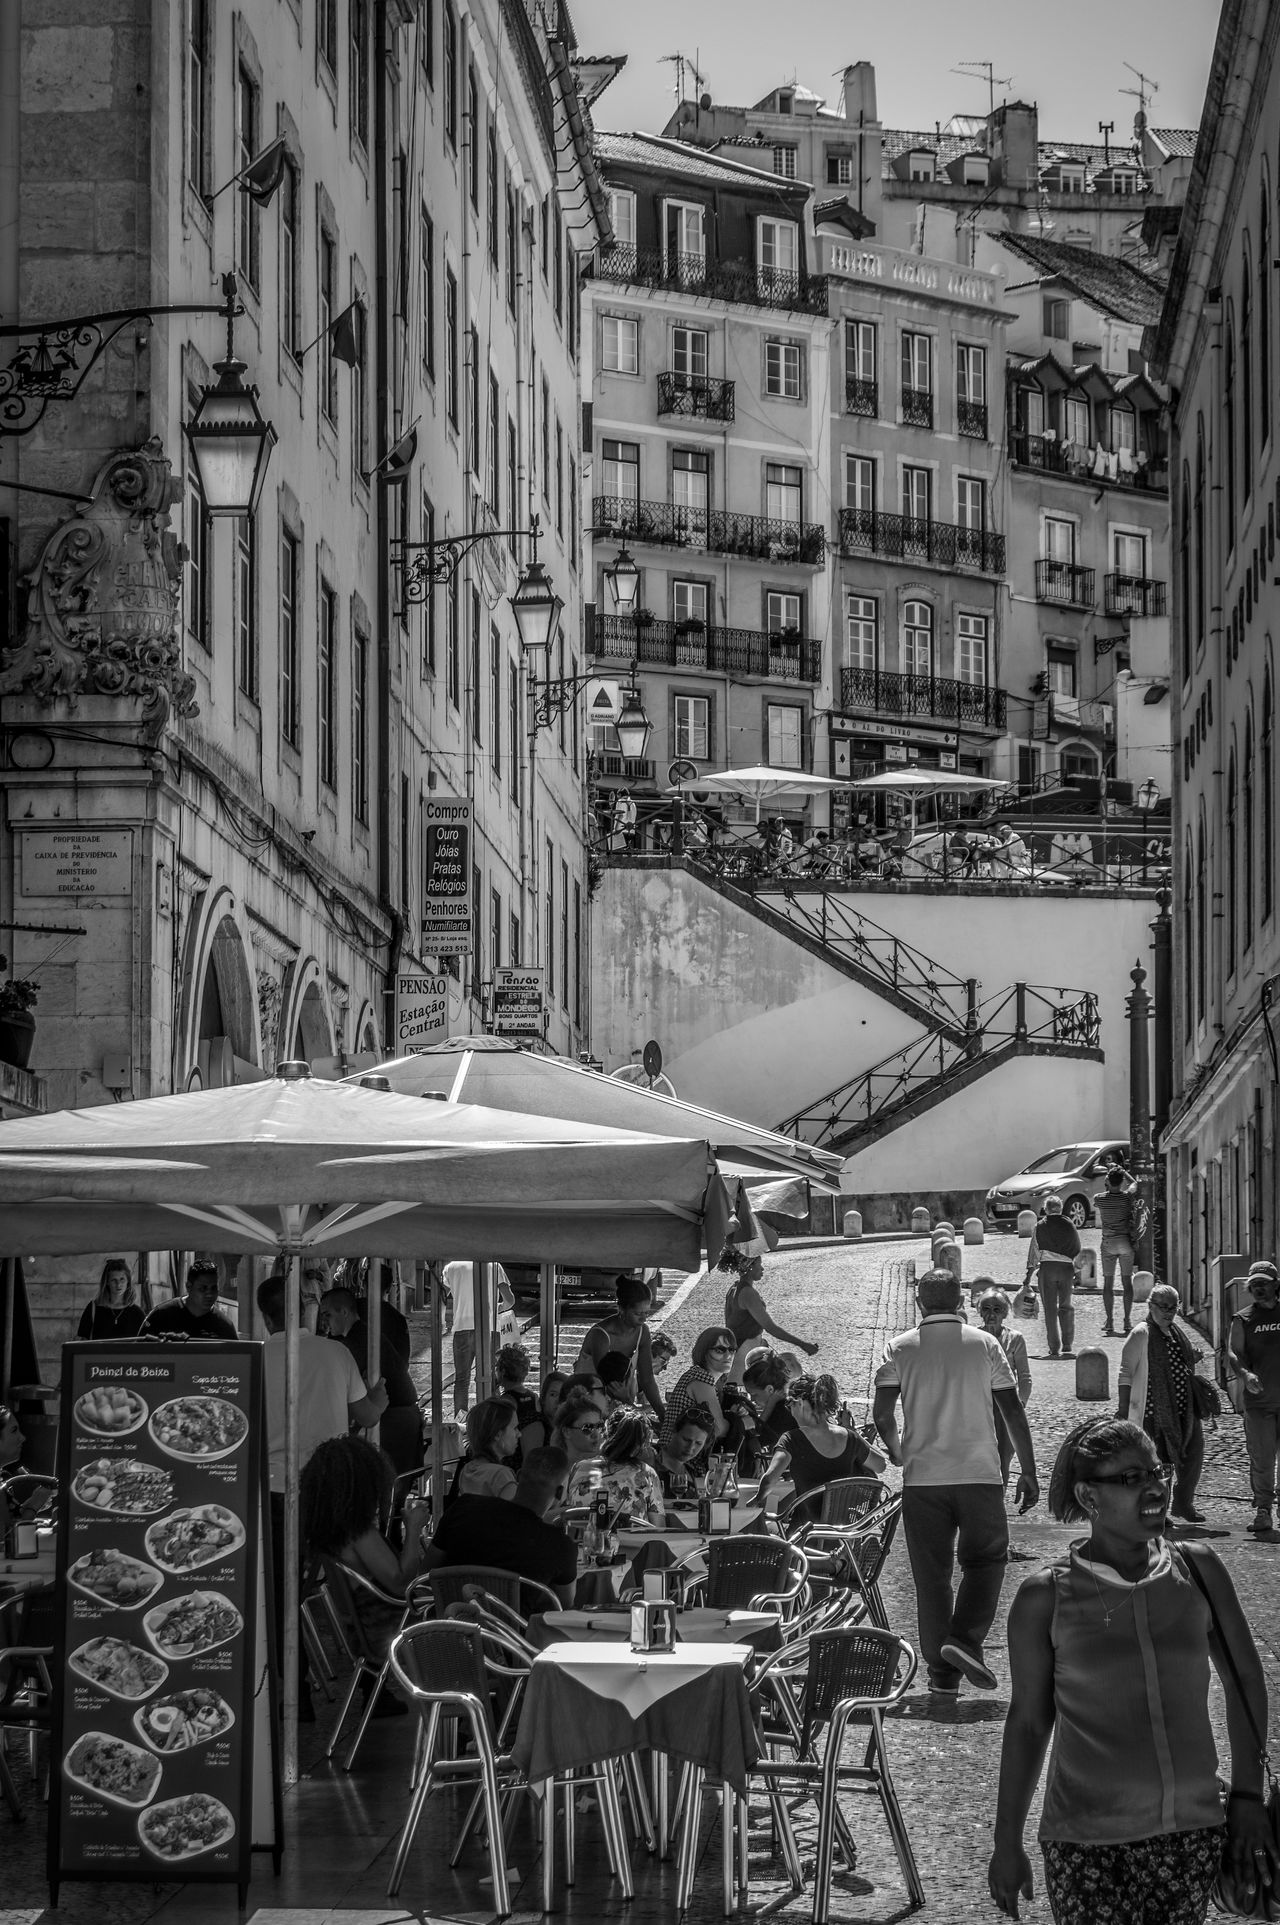 Black & White Black And White Blackandwhite City City Life City Street Lisboa Lisboa Portugal Lisboaamor Lisboalive Lisbon Lisbon - Portugal Lisbon City Life Lisbon In Black And White Lisbon, Portugal Lisbona Lisbonlife Lisbonlovers Lisbonne Lisbonne En Noir Et Blanc Street Street Photography Streetphoto_bw Urban Urbanphotography First Eyeem Photo